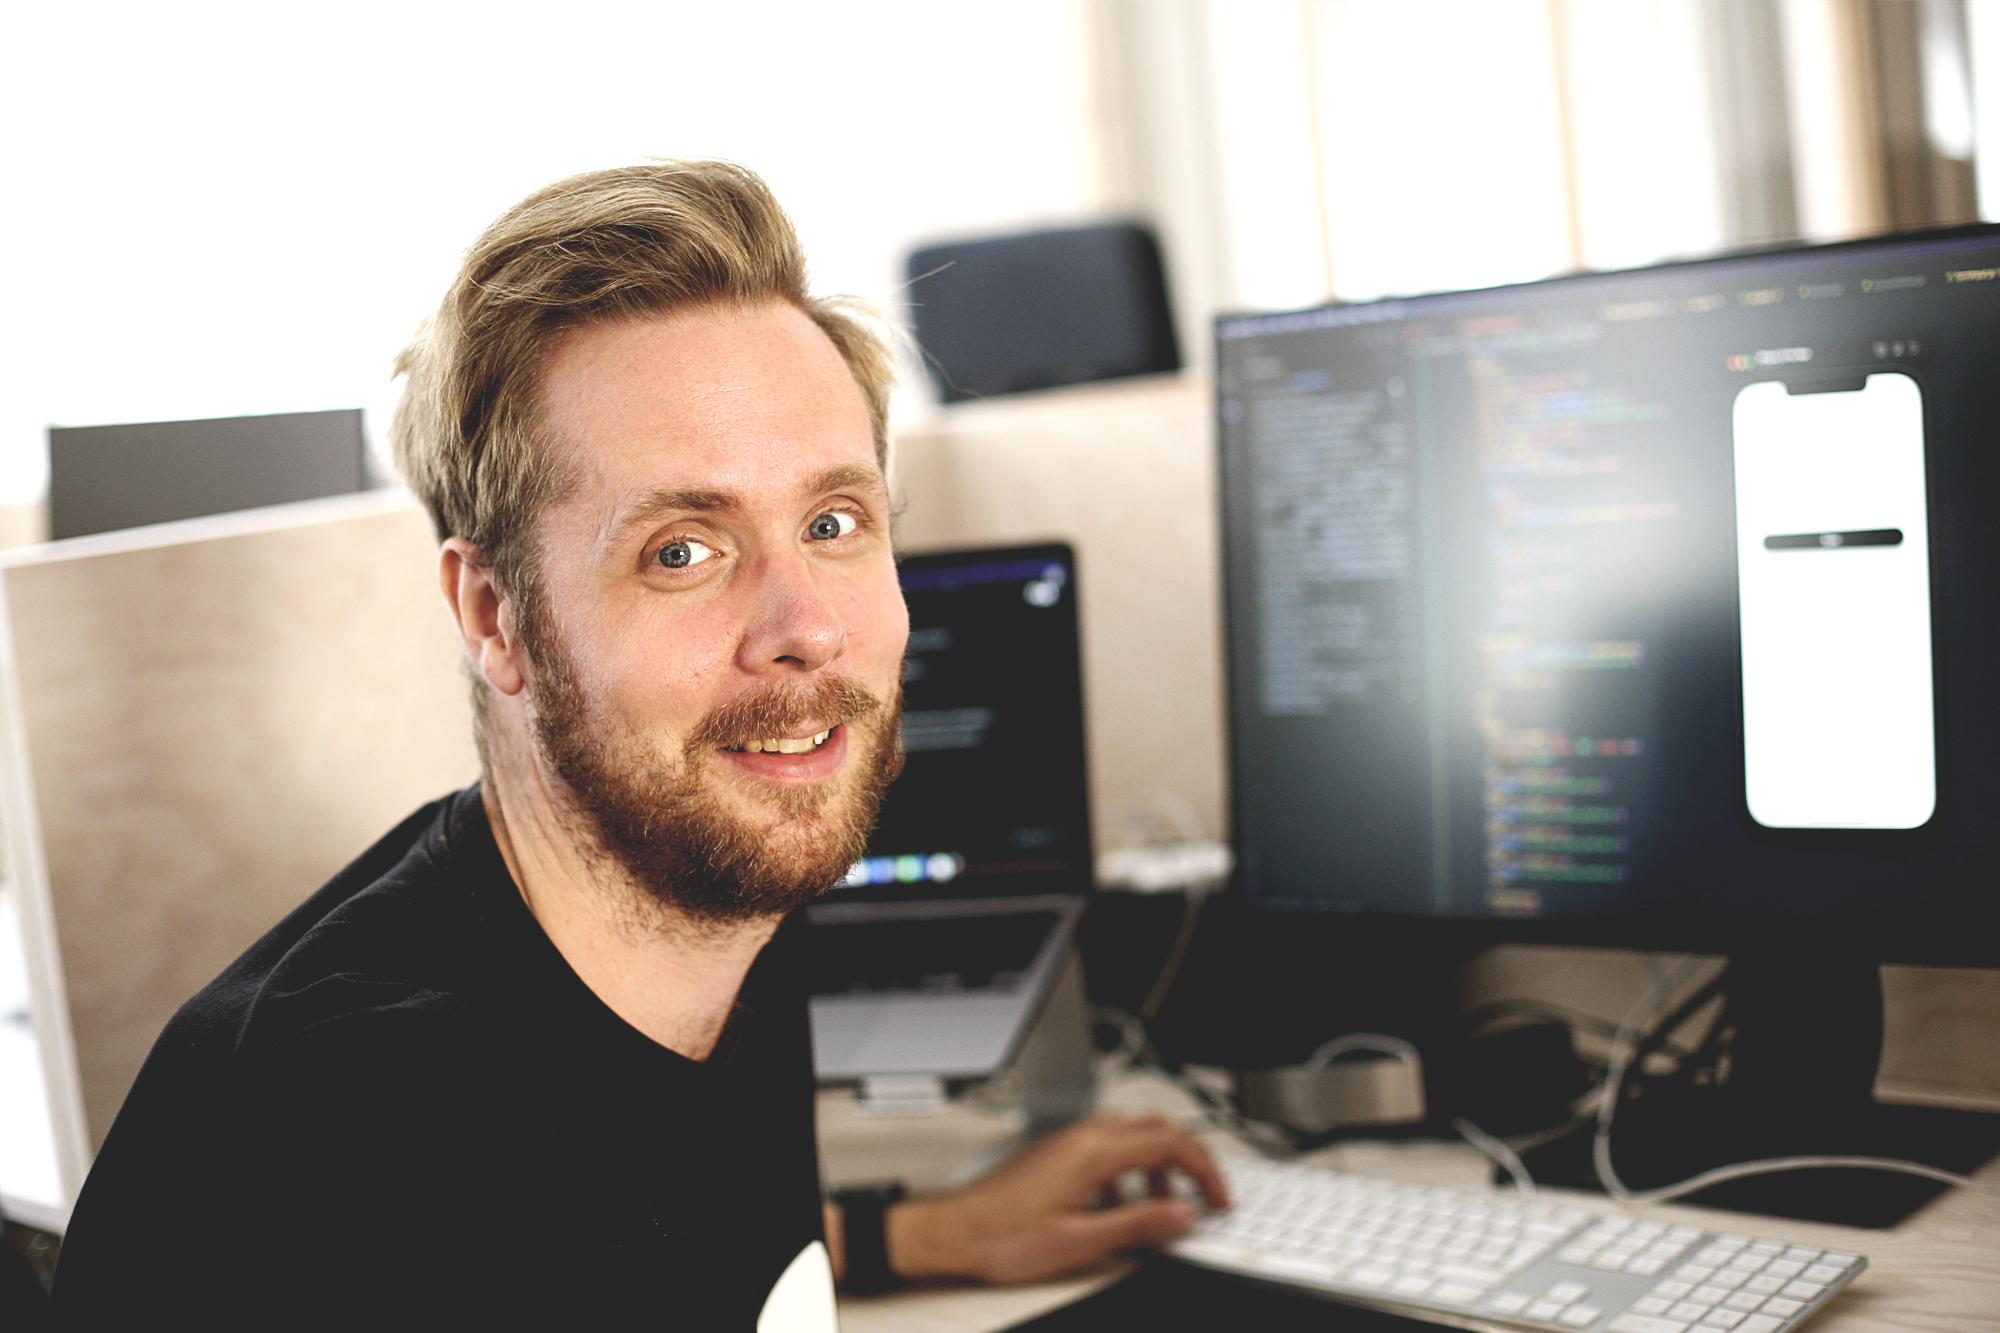 """Djäkne Startup Studio suits me perfectly"""